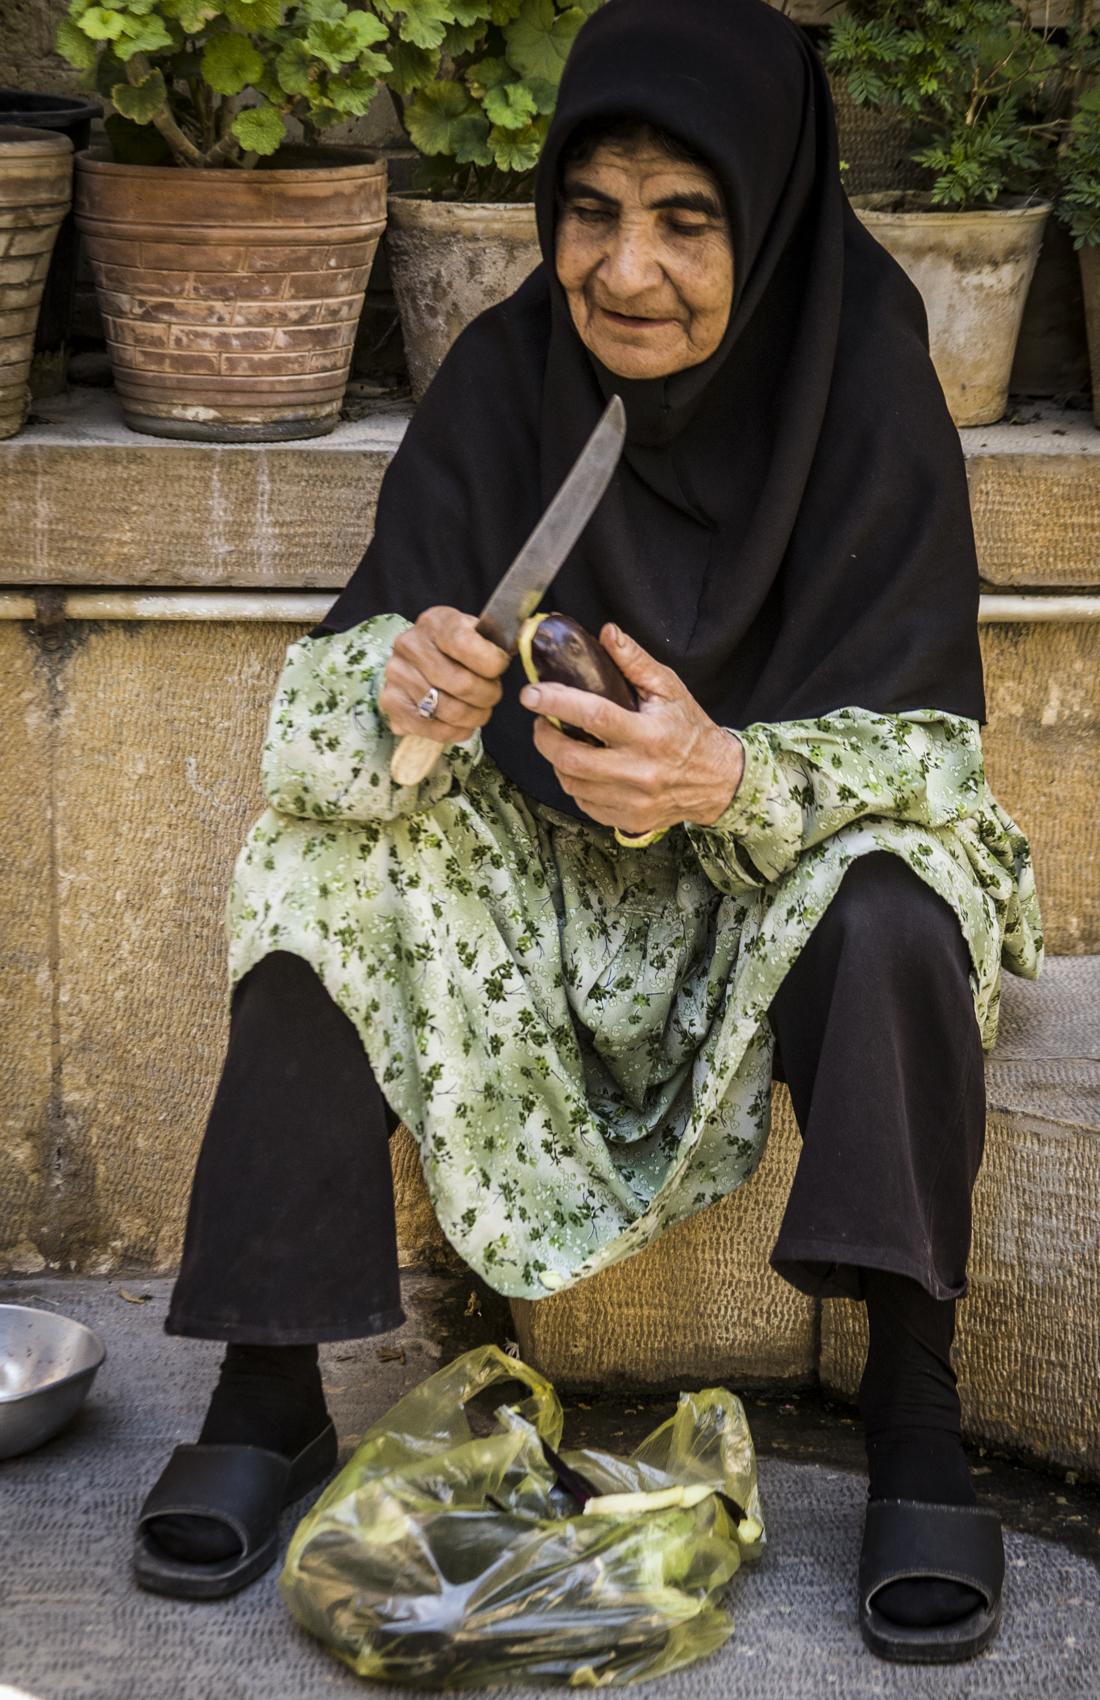 Peeling eggplant, Shiraz